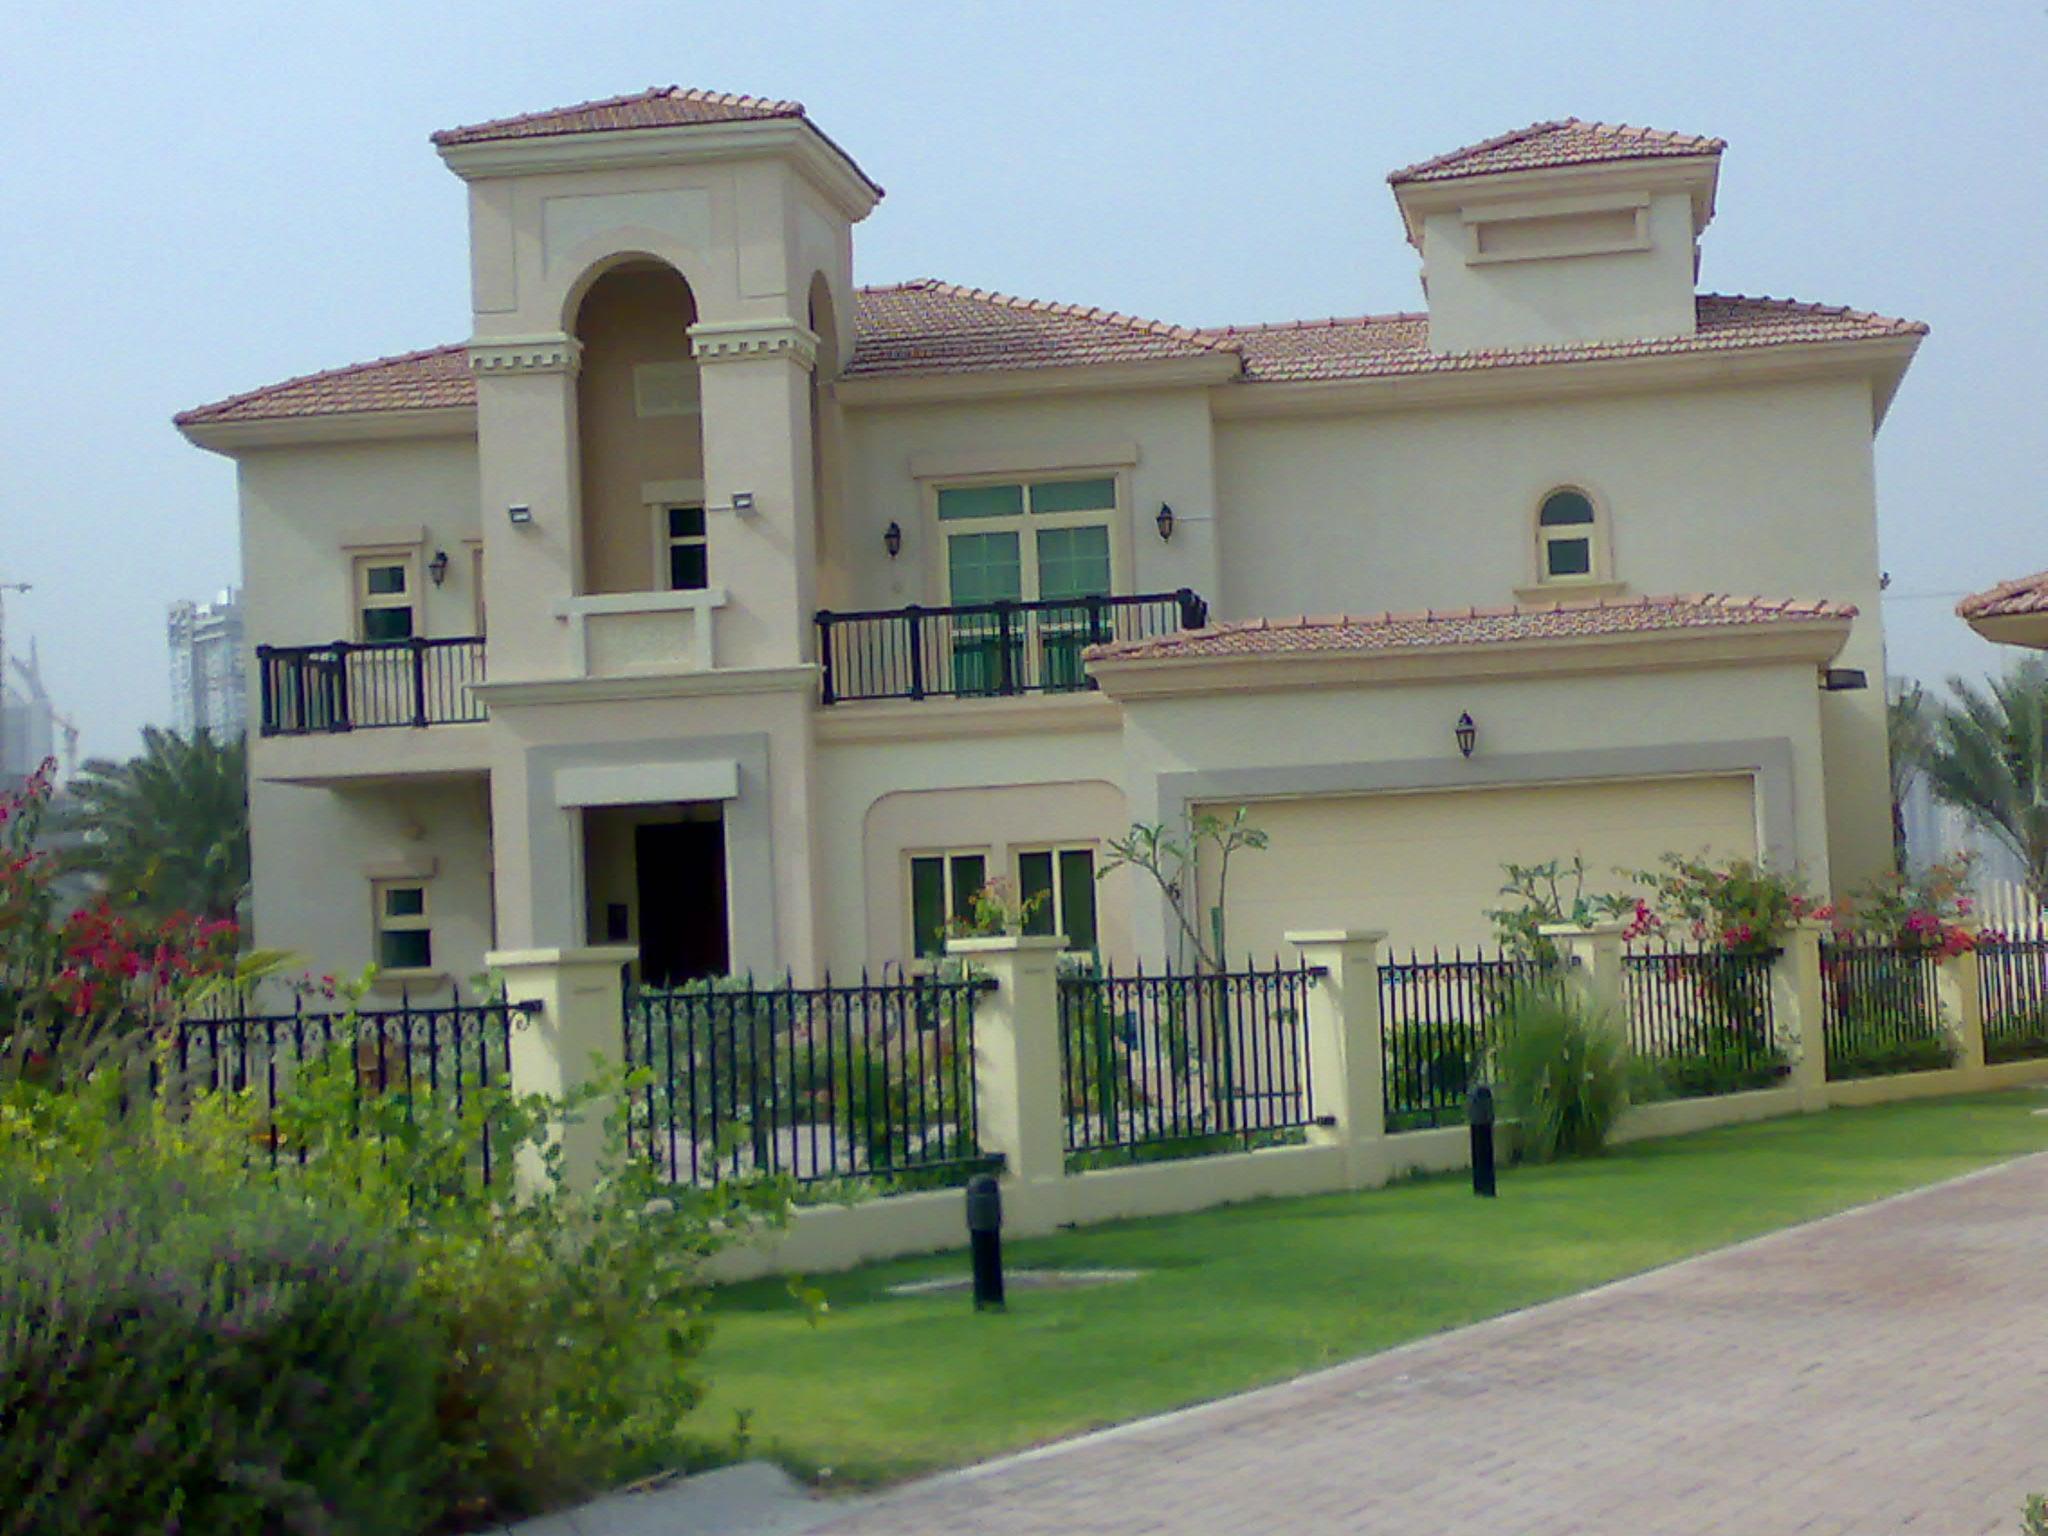 288 Villas At Jumeirah - Dubai